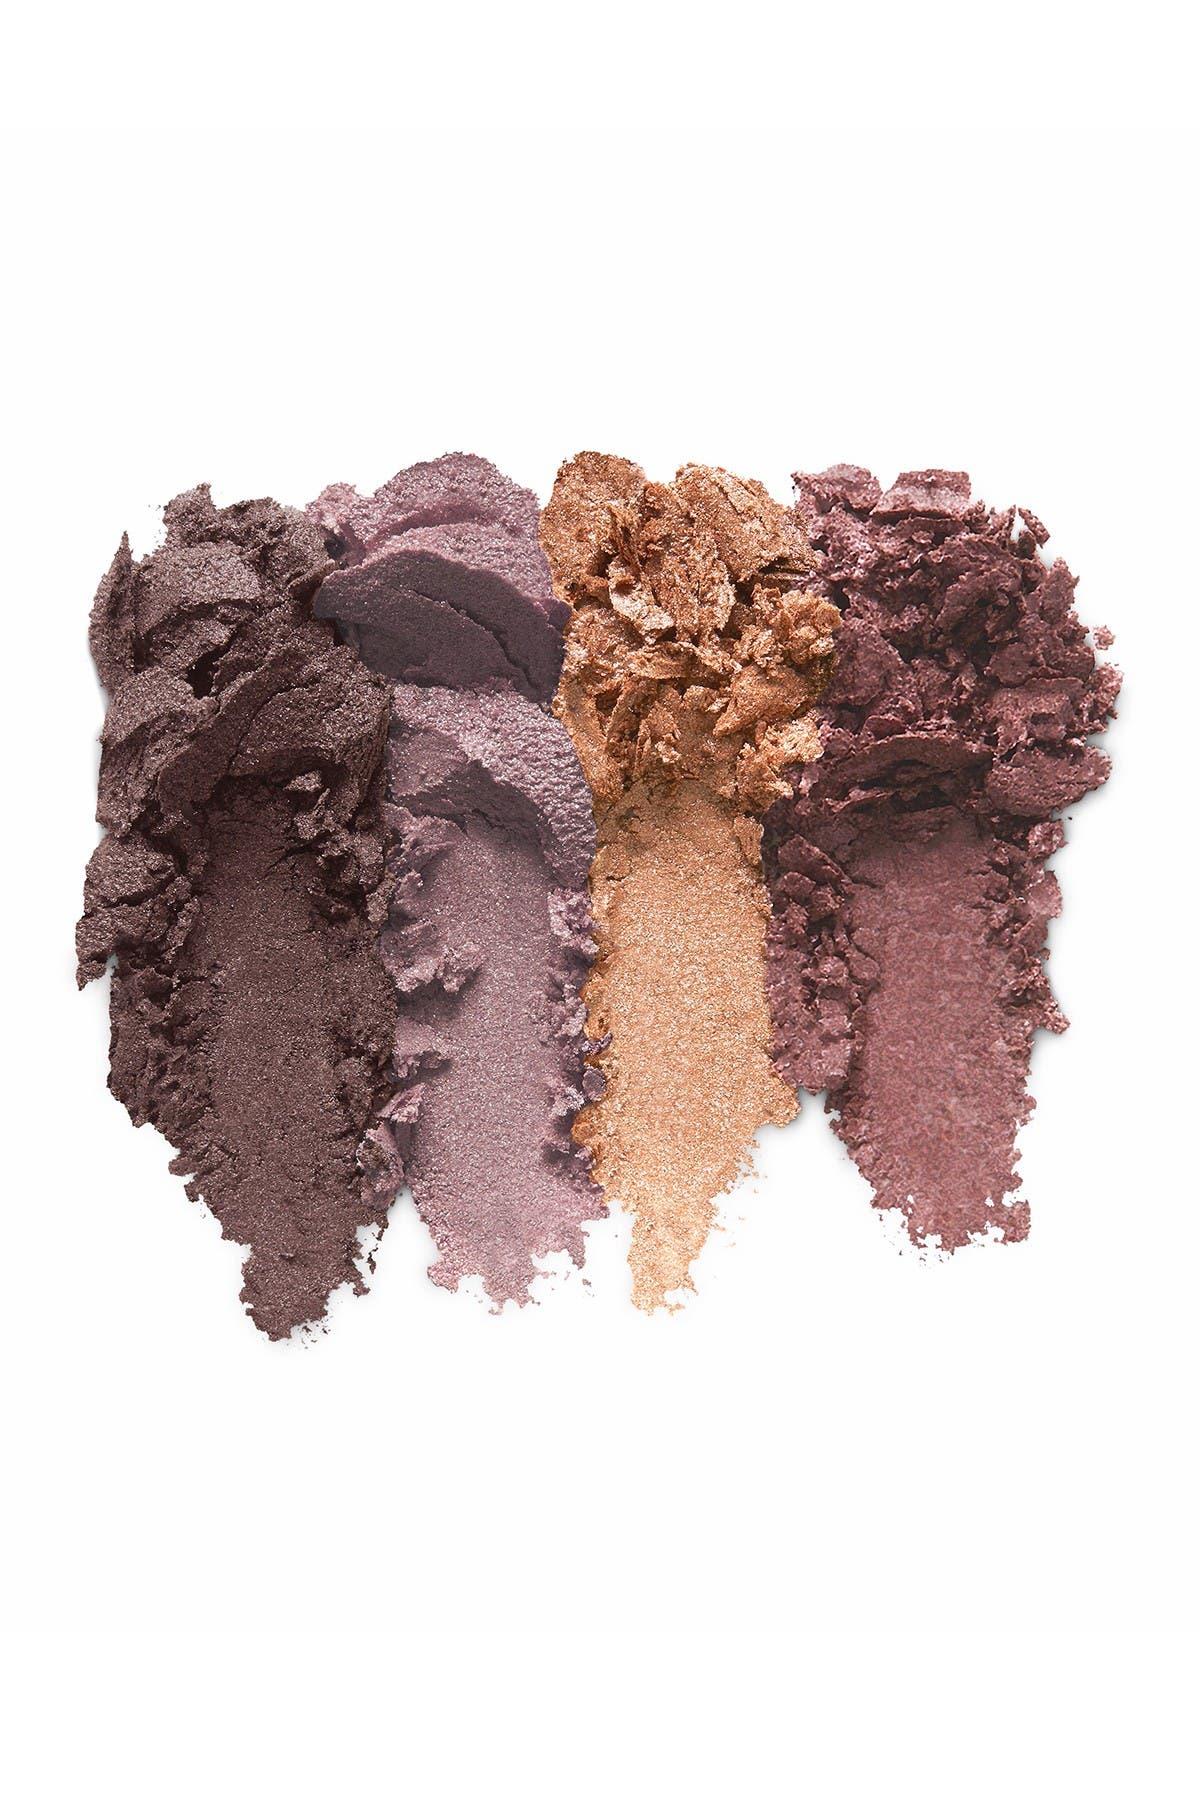 Image of Kiko Milano Bright Quartet Baked Eyeshadow Palette - 02 Rosy Mauve Variation